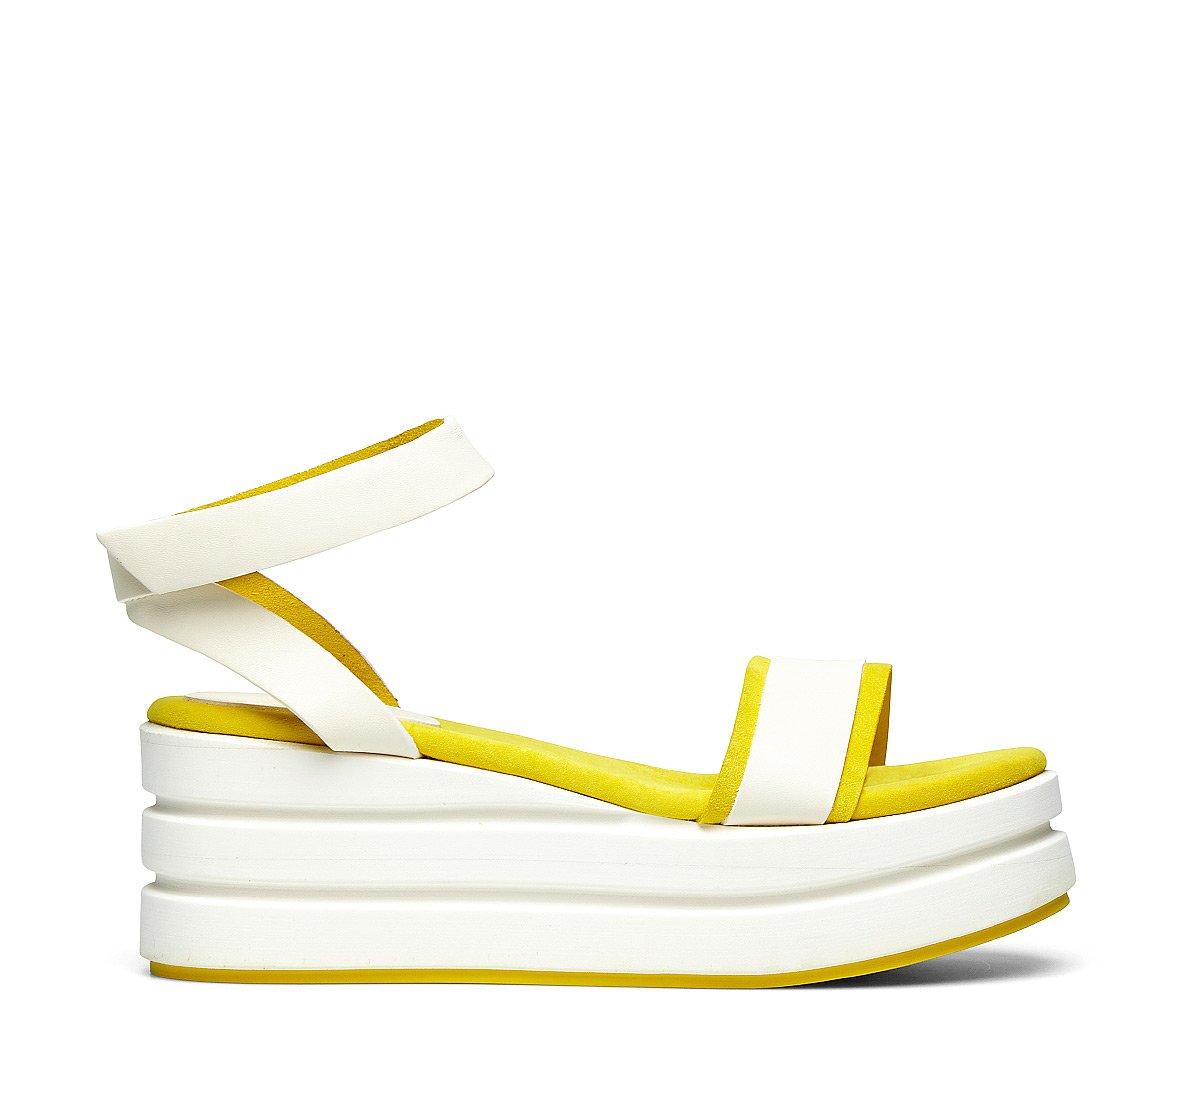 Calfskin and suede platform shoes